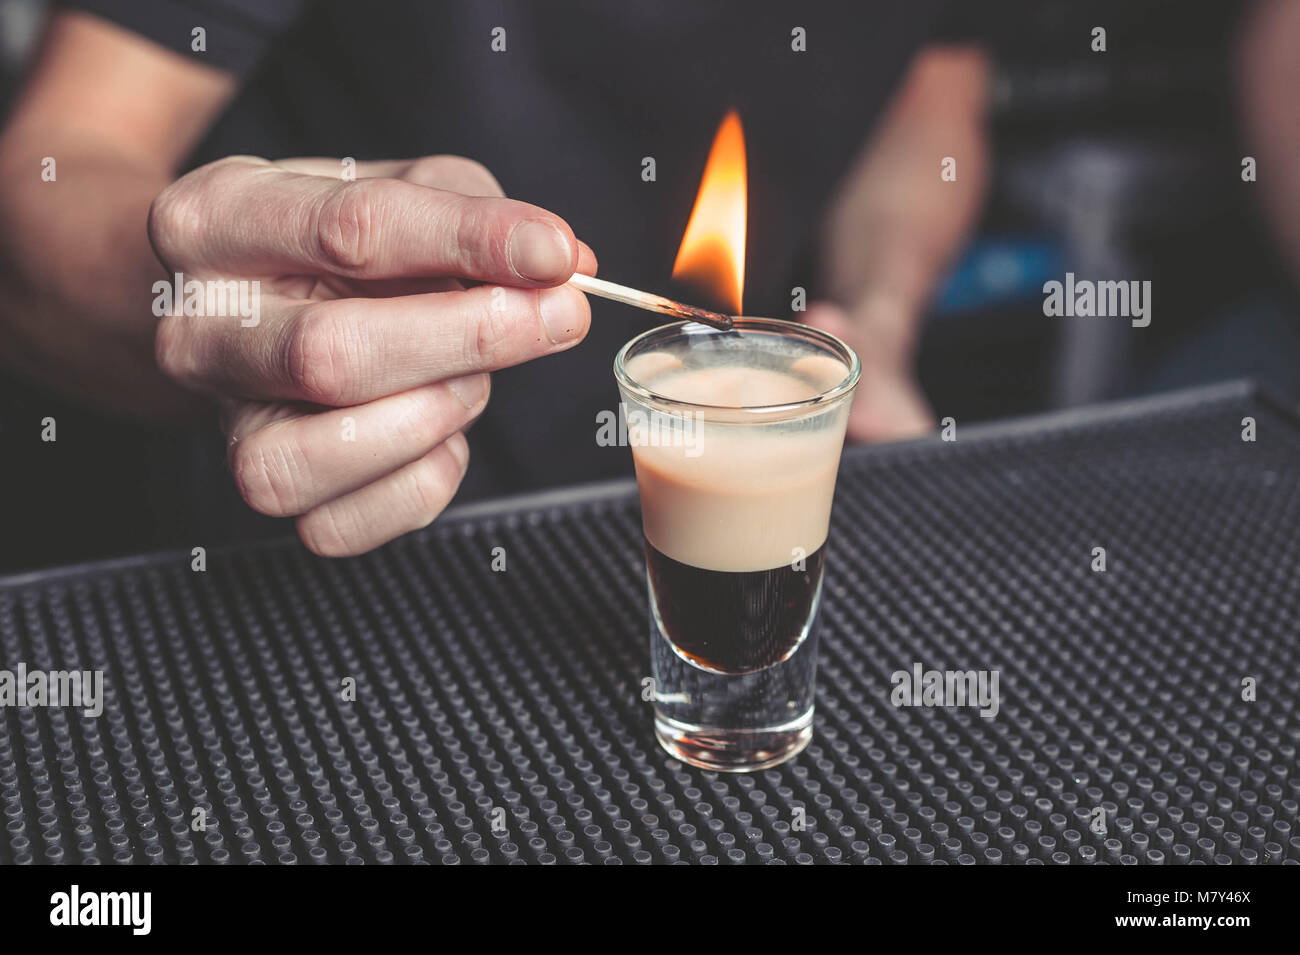 Barman flaming cocktail B-52 on the bar - Stock Image